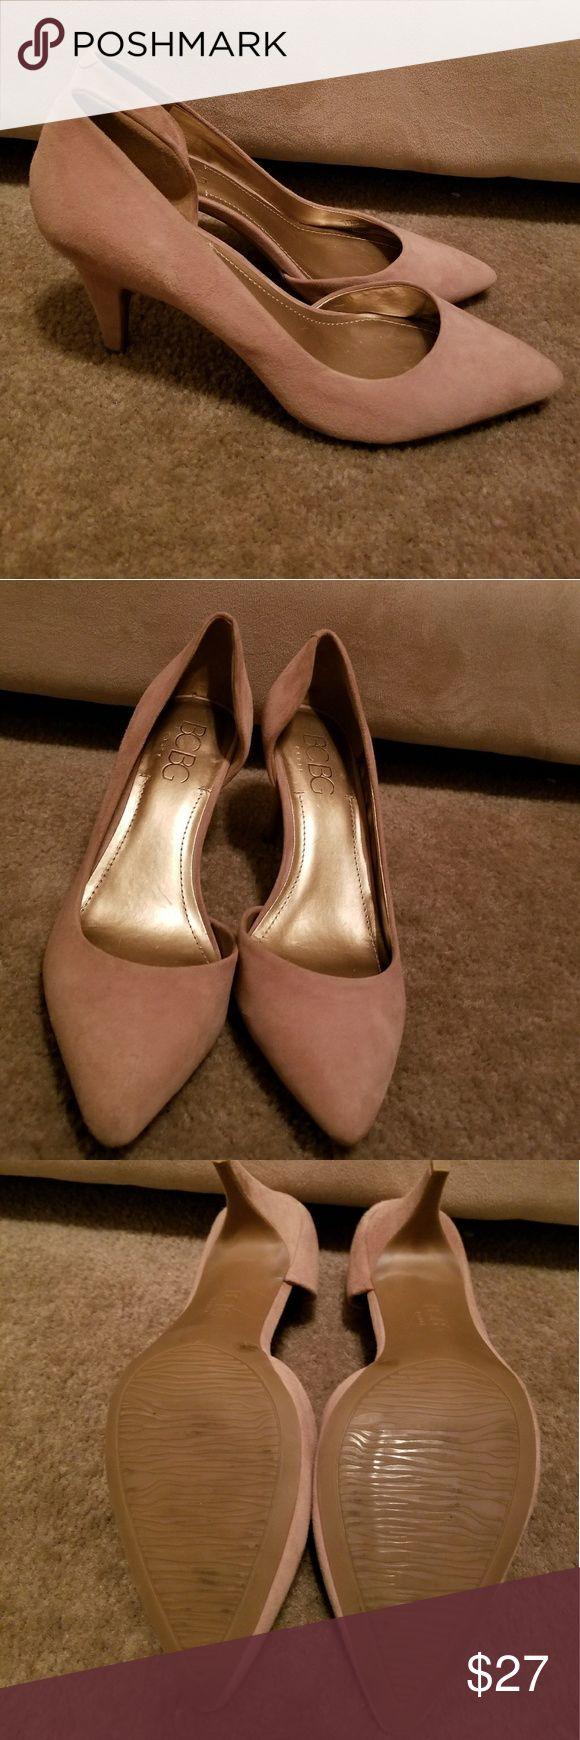 Tan kitten heels BING brand kitten heels tan BCBG Shoes Heels